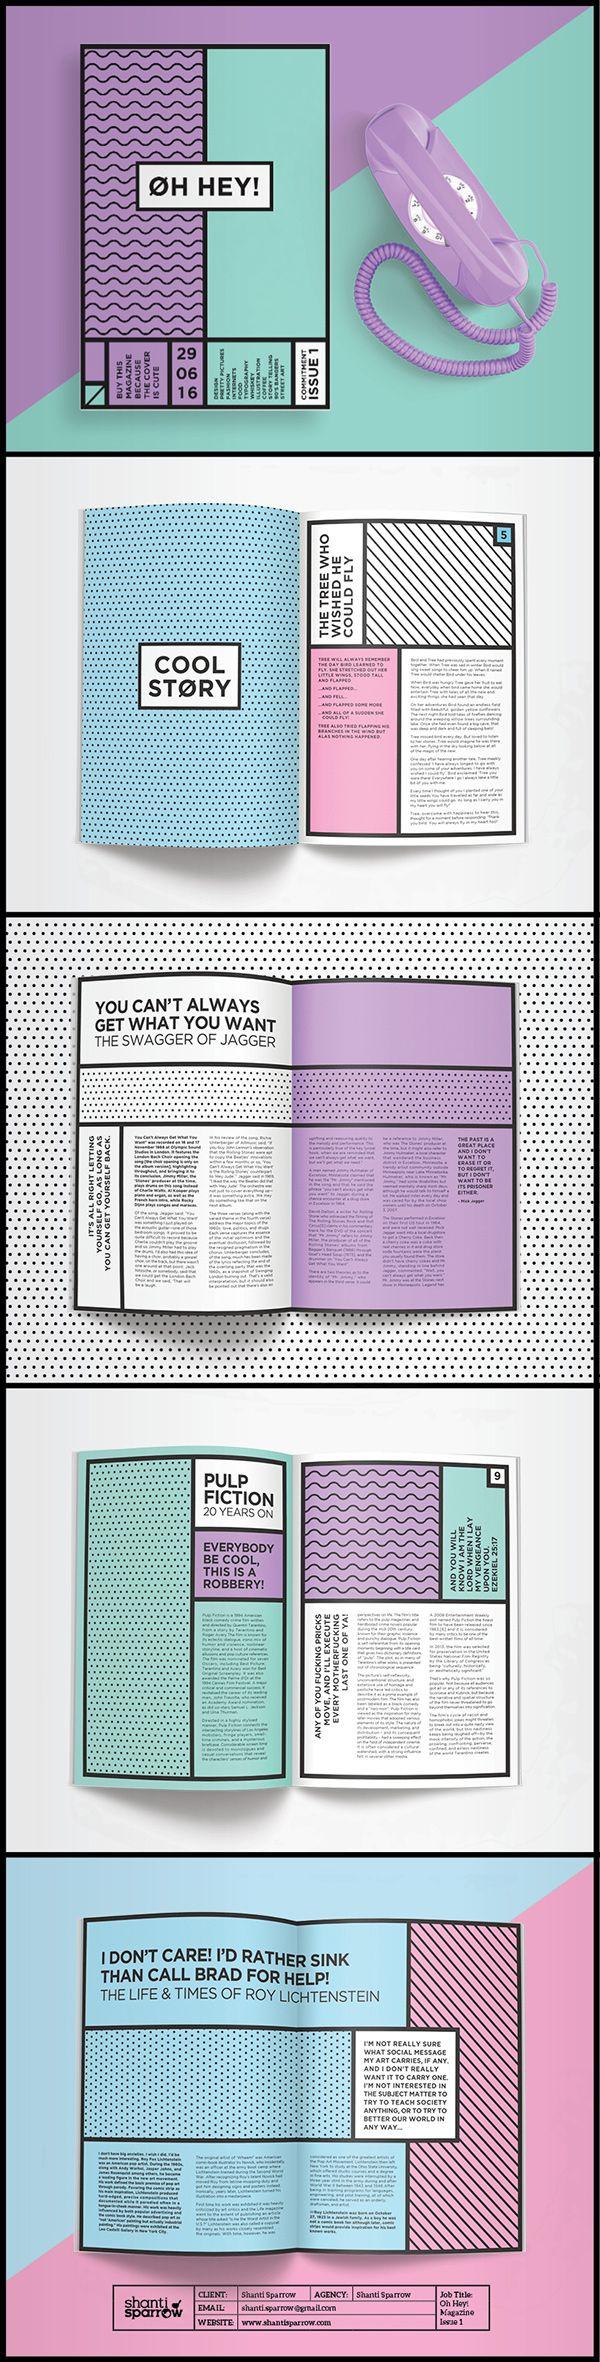 Oh Hey! Magazine on Behance